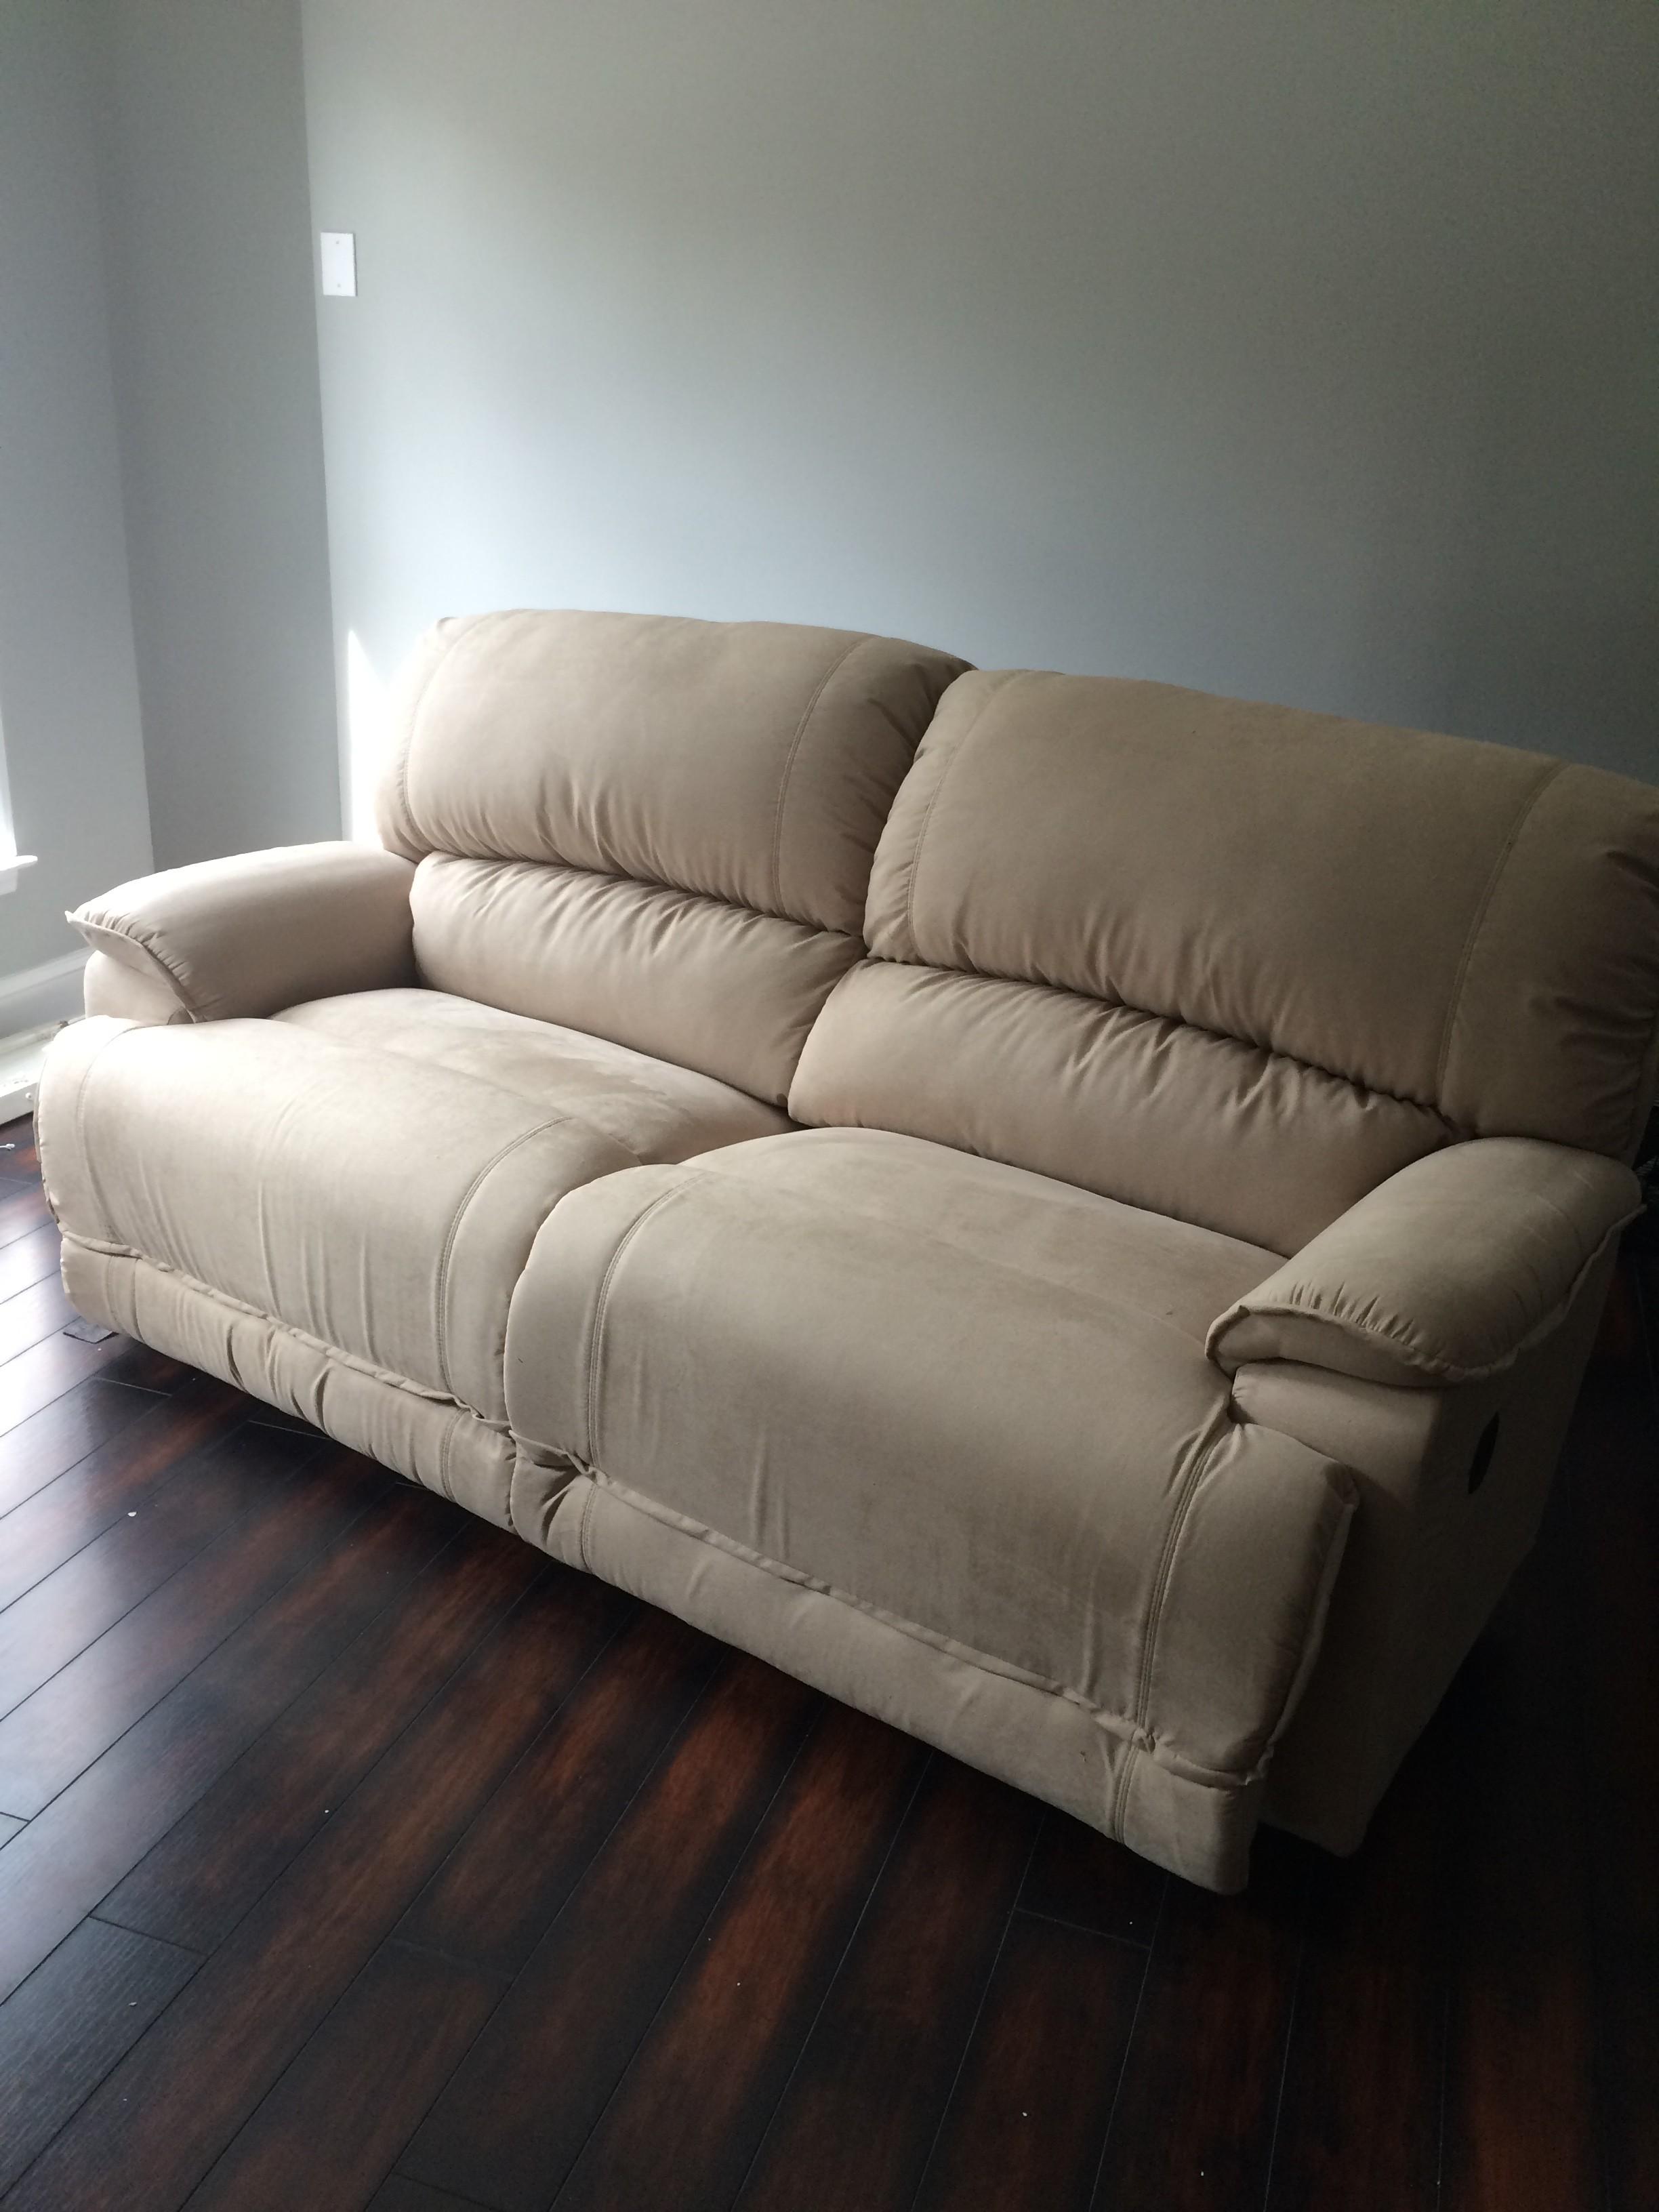 New La-Z-Boy couch